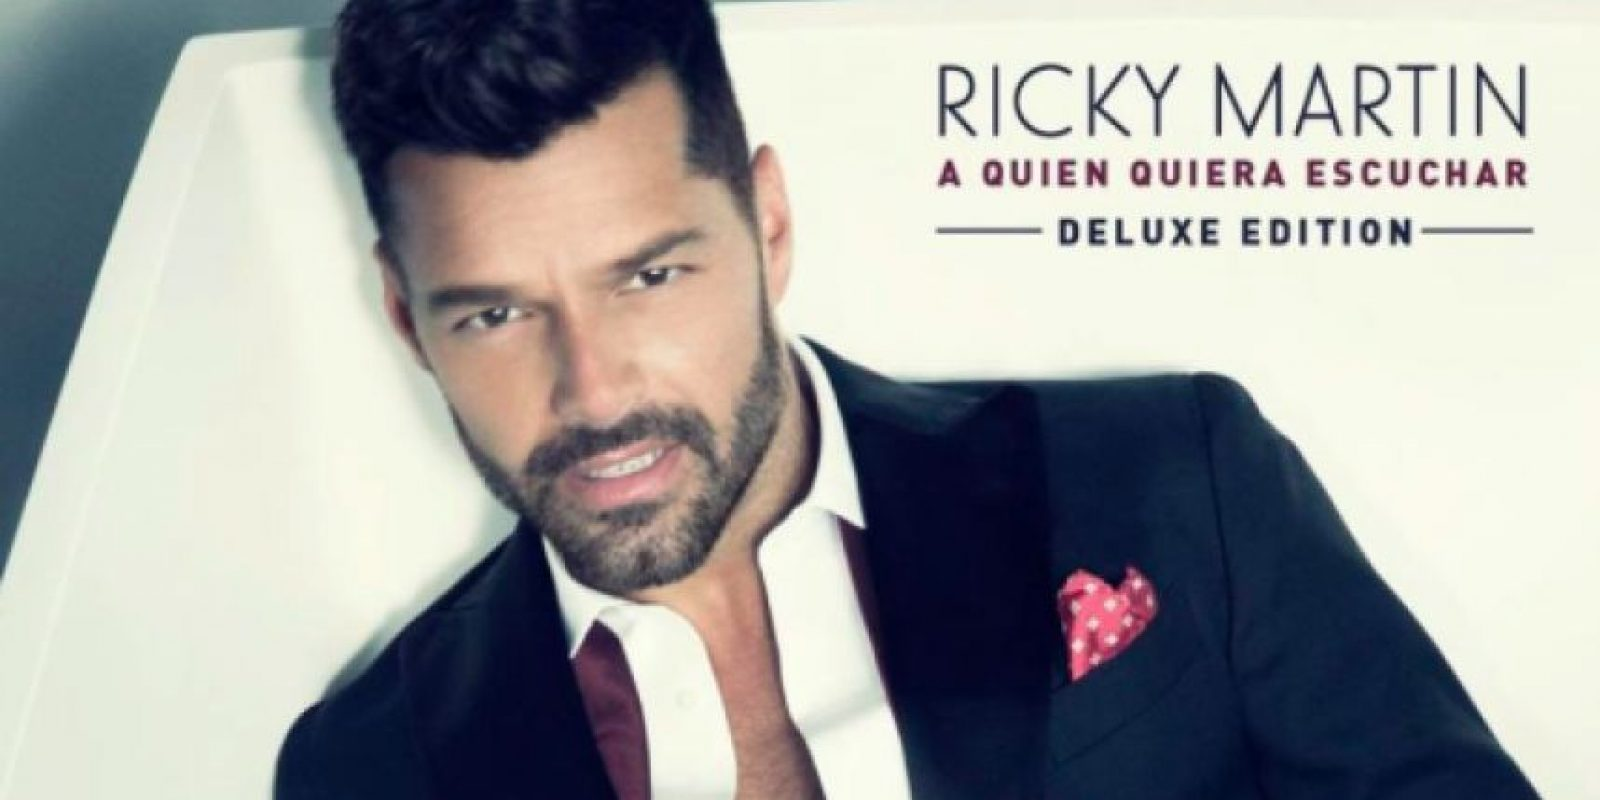 Foto:Vía Facebook/RickyMartinOfficialPage